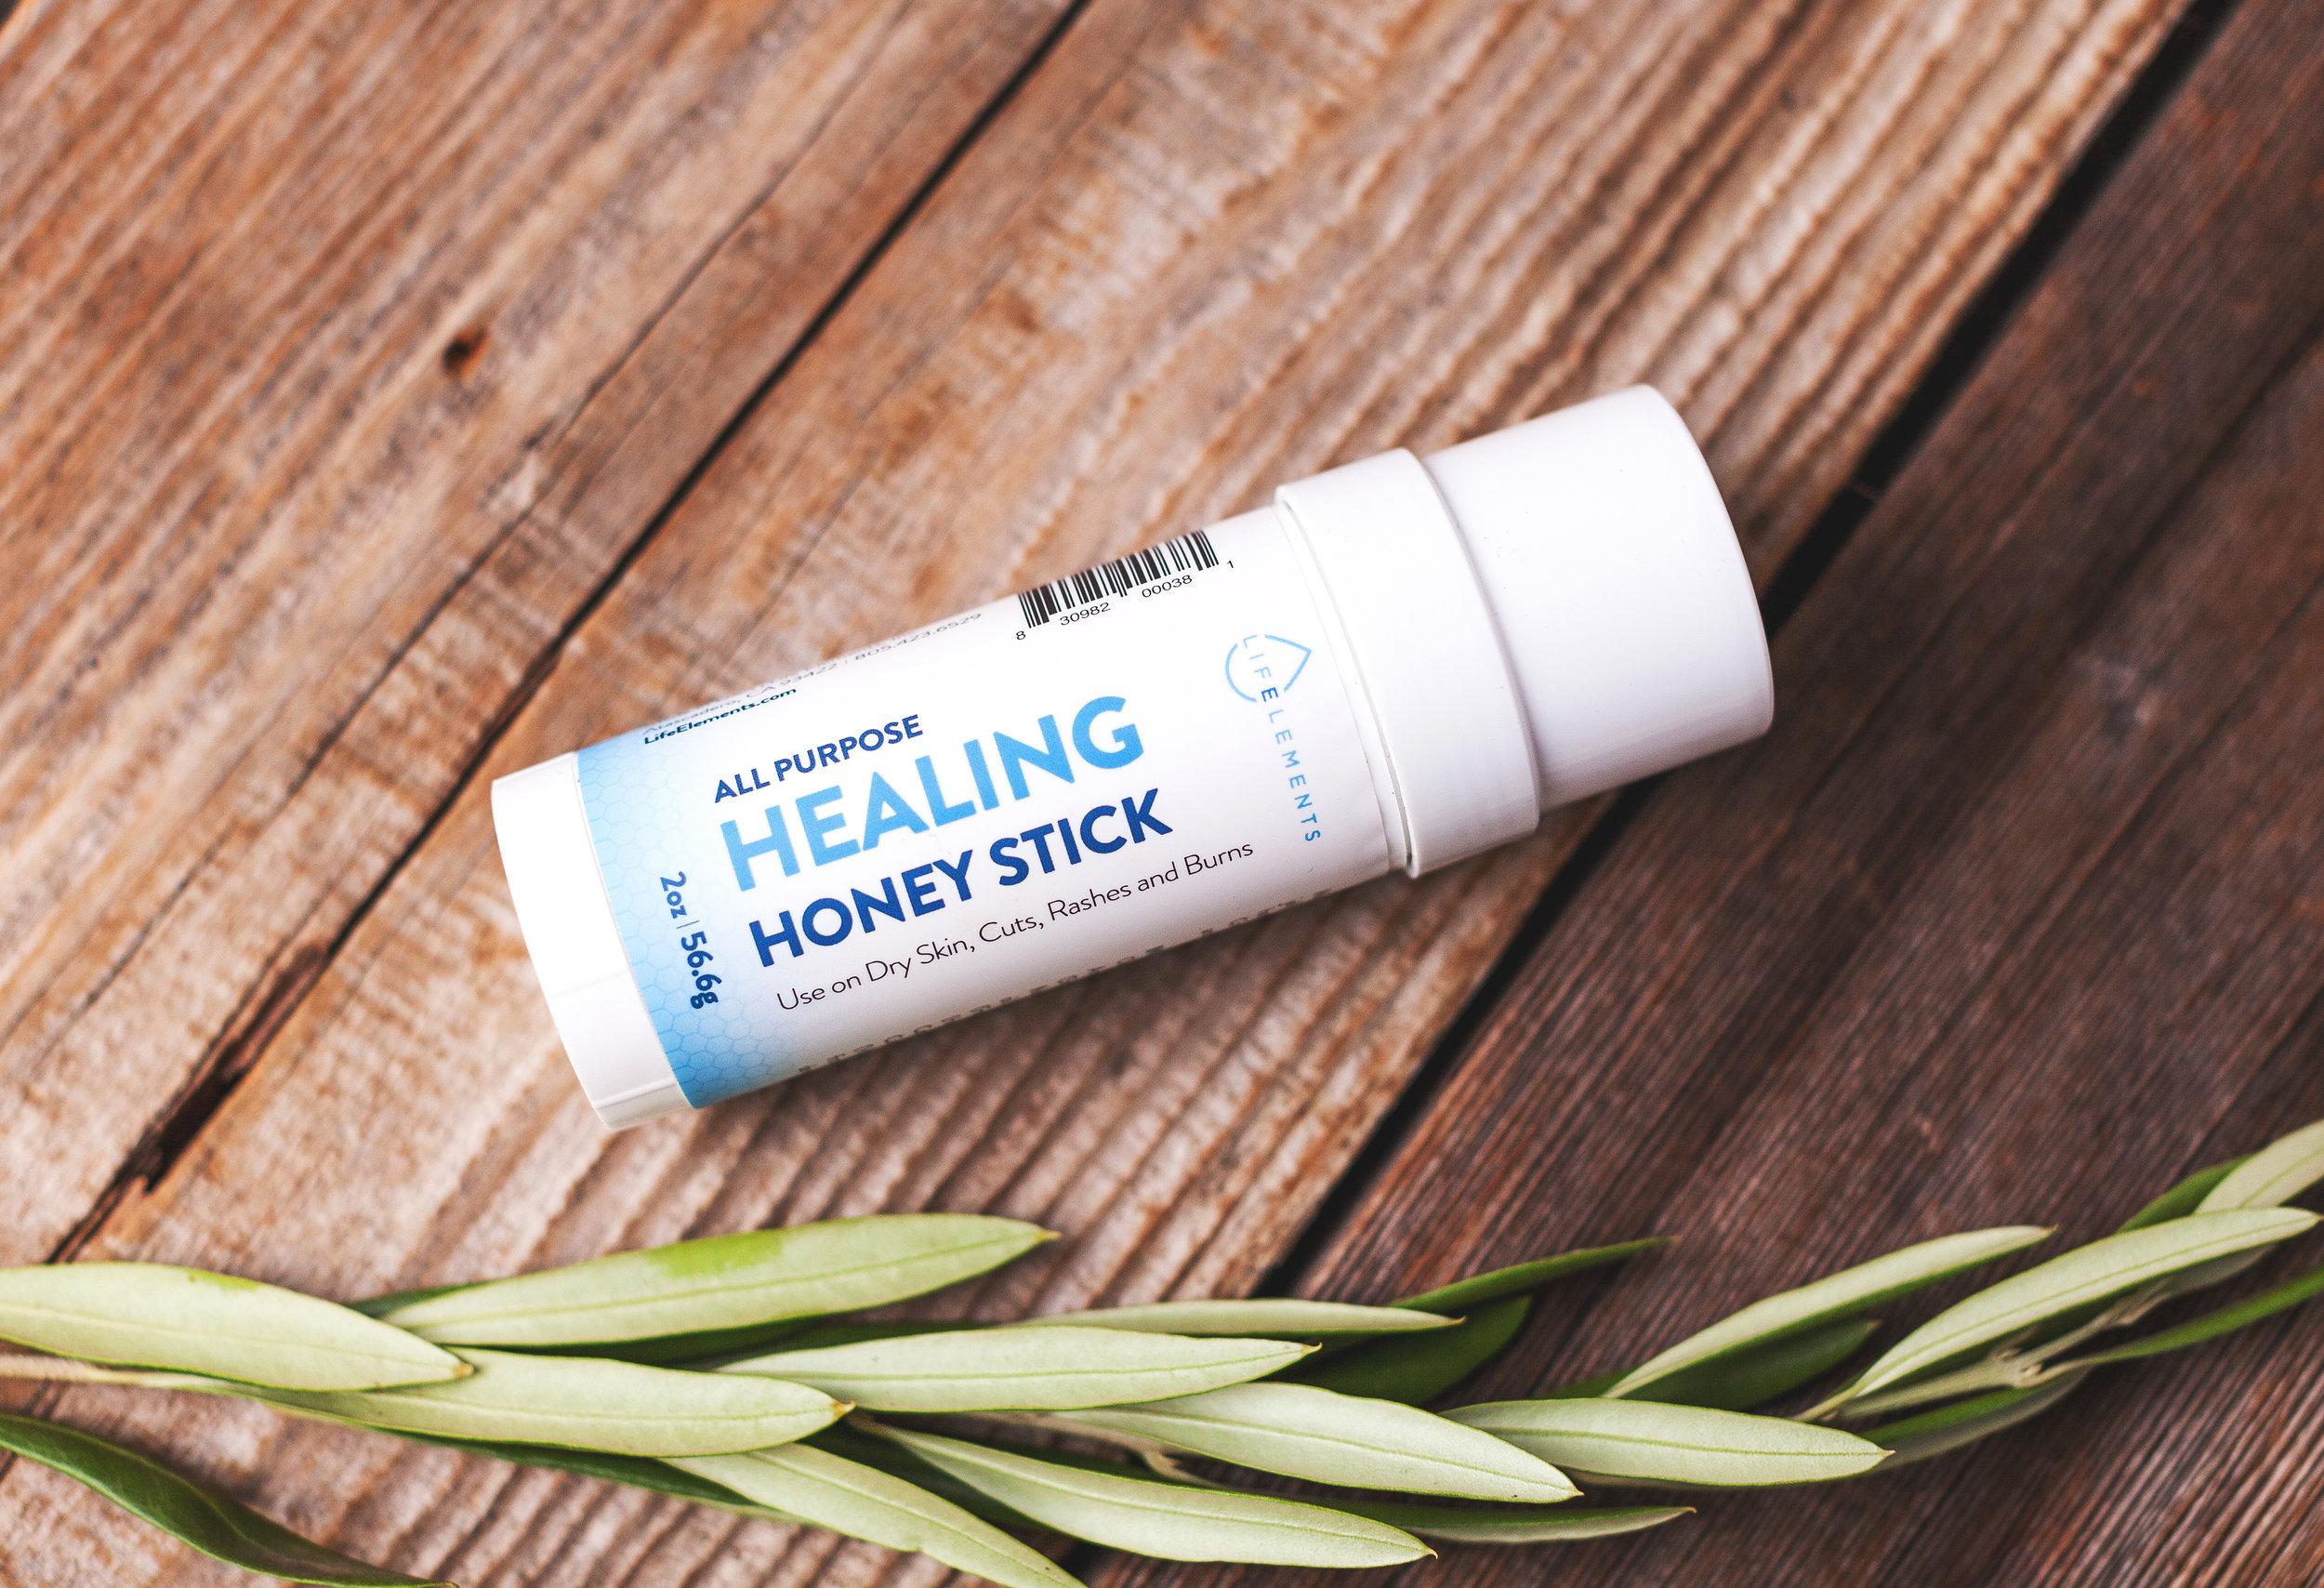 LIFEELEMENTSOctober2018-HealingHoneyStick.jpg